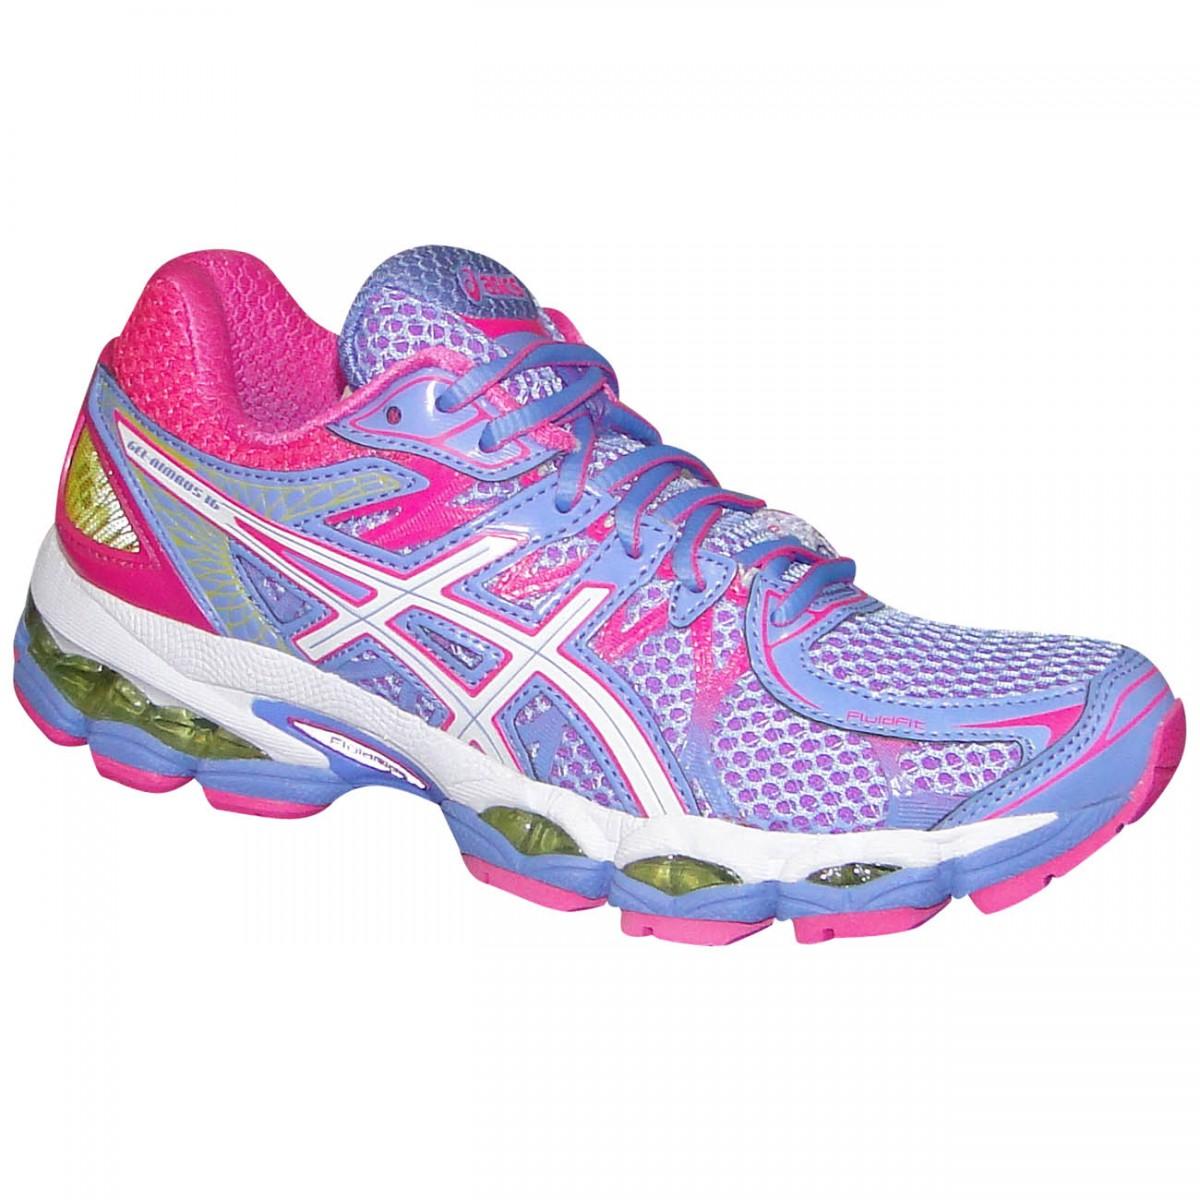 a739aabb7f8 Tenis Asics Gel-Nimbus 16 T485N 3601 - Lilas Pink Branco - Chuteira Nike